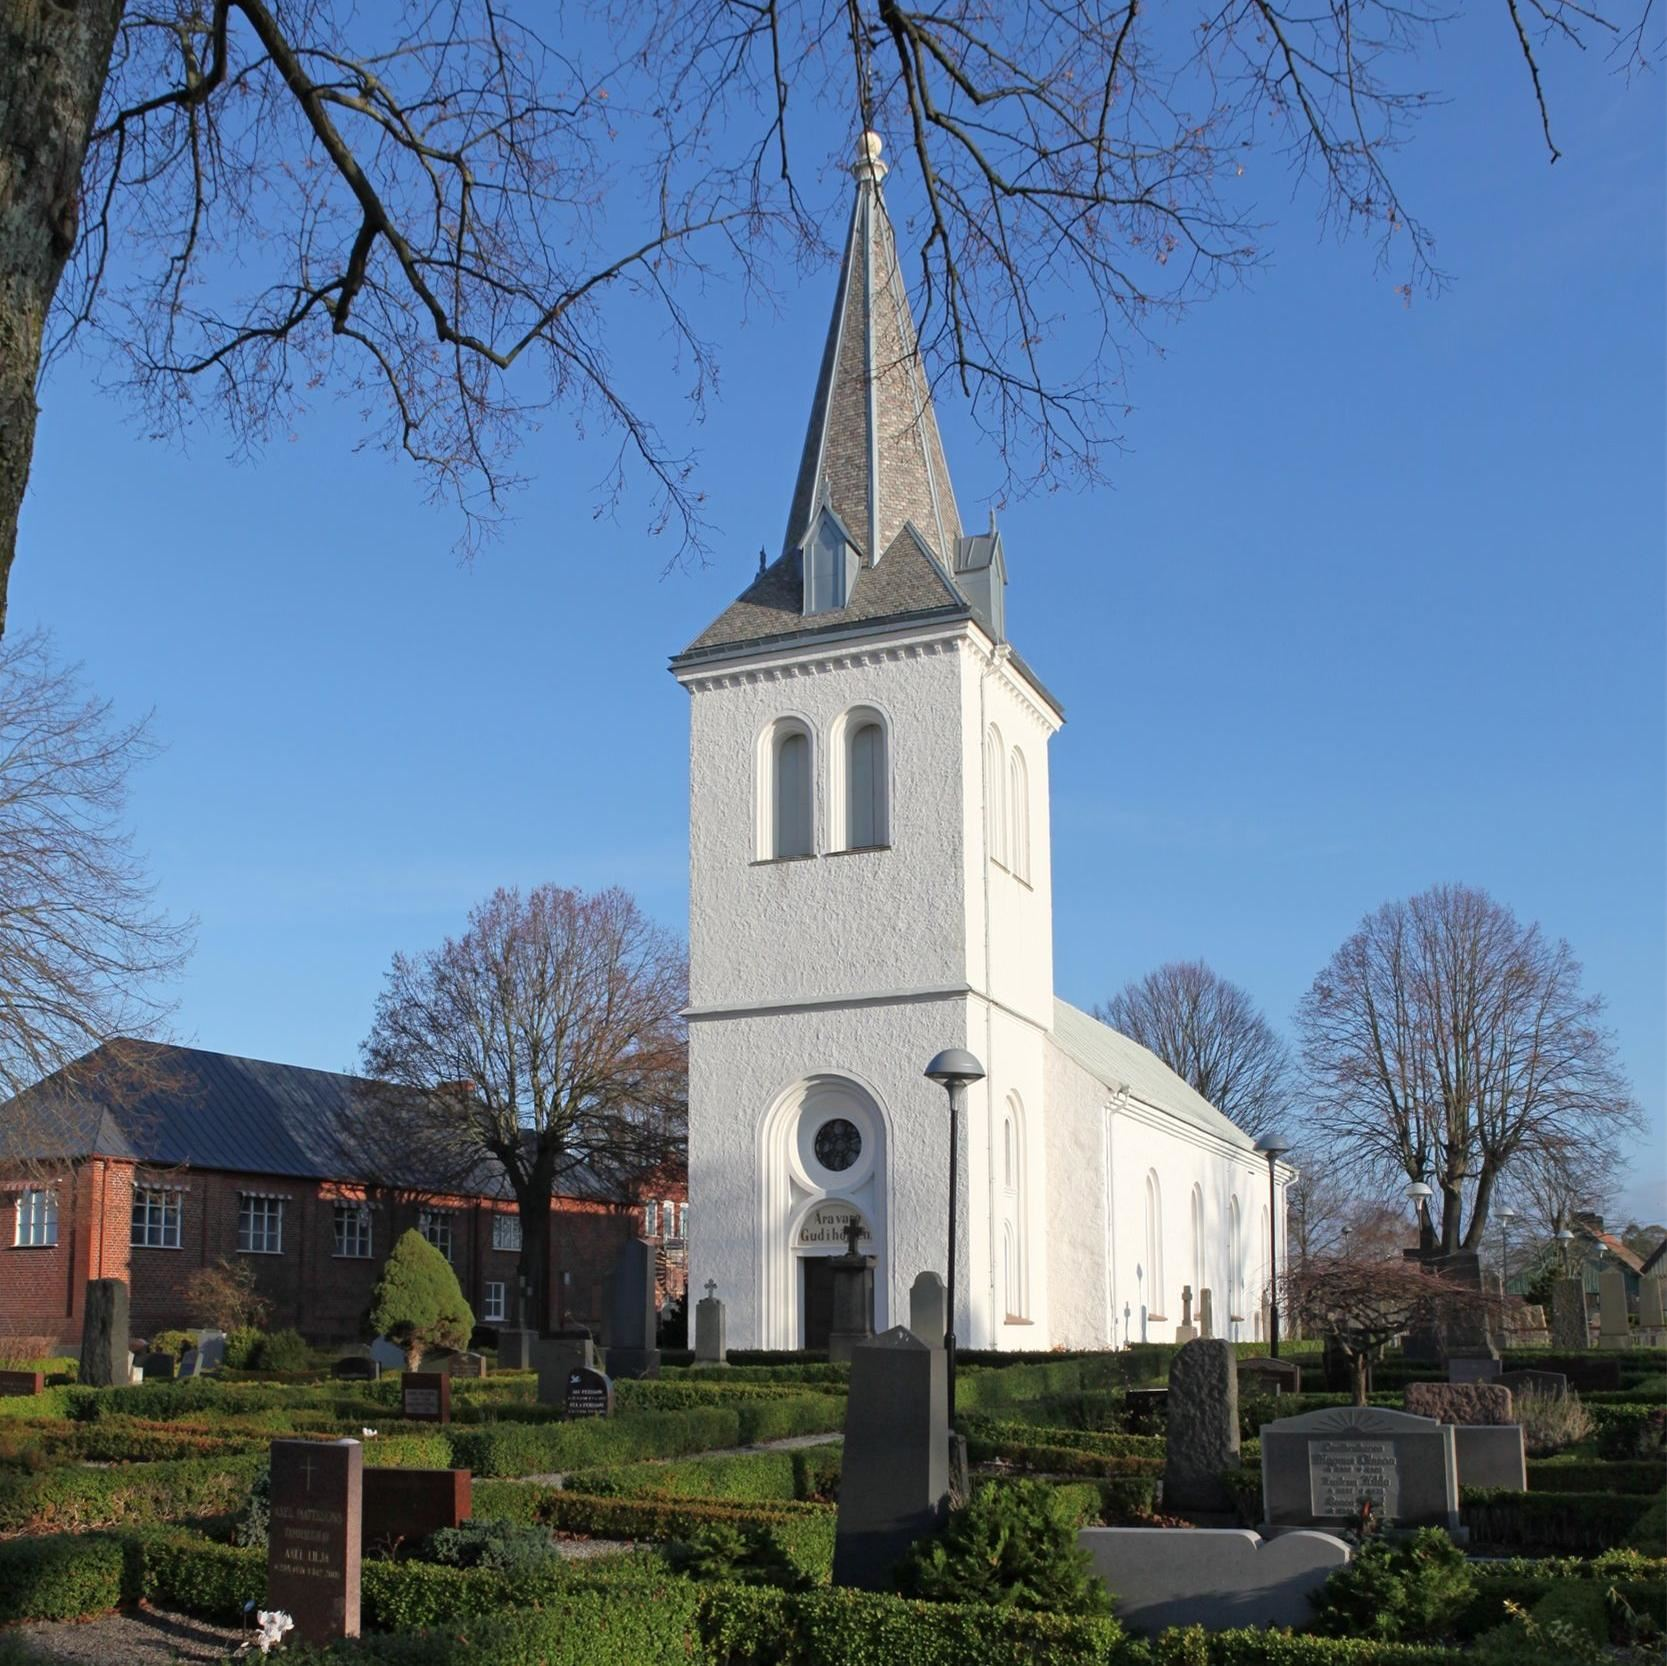 Lackalänga Kirche